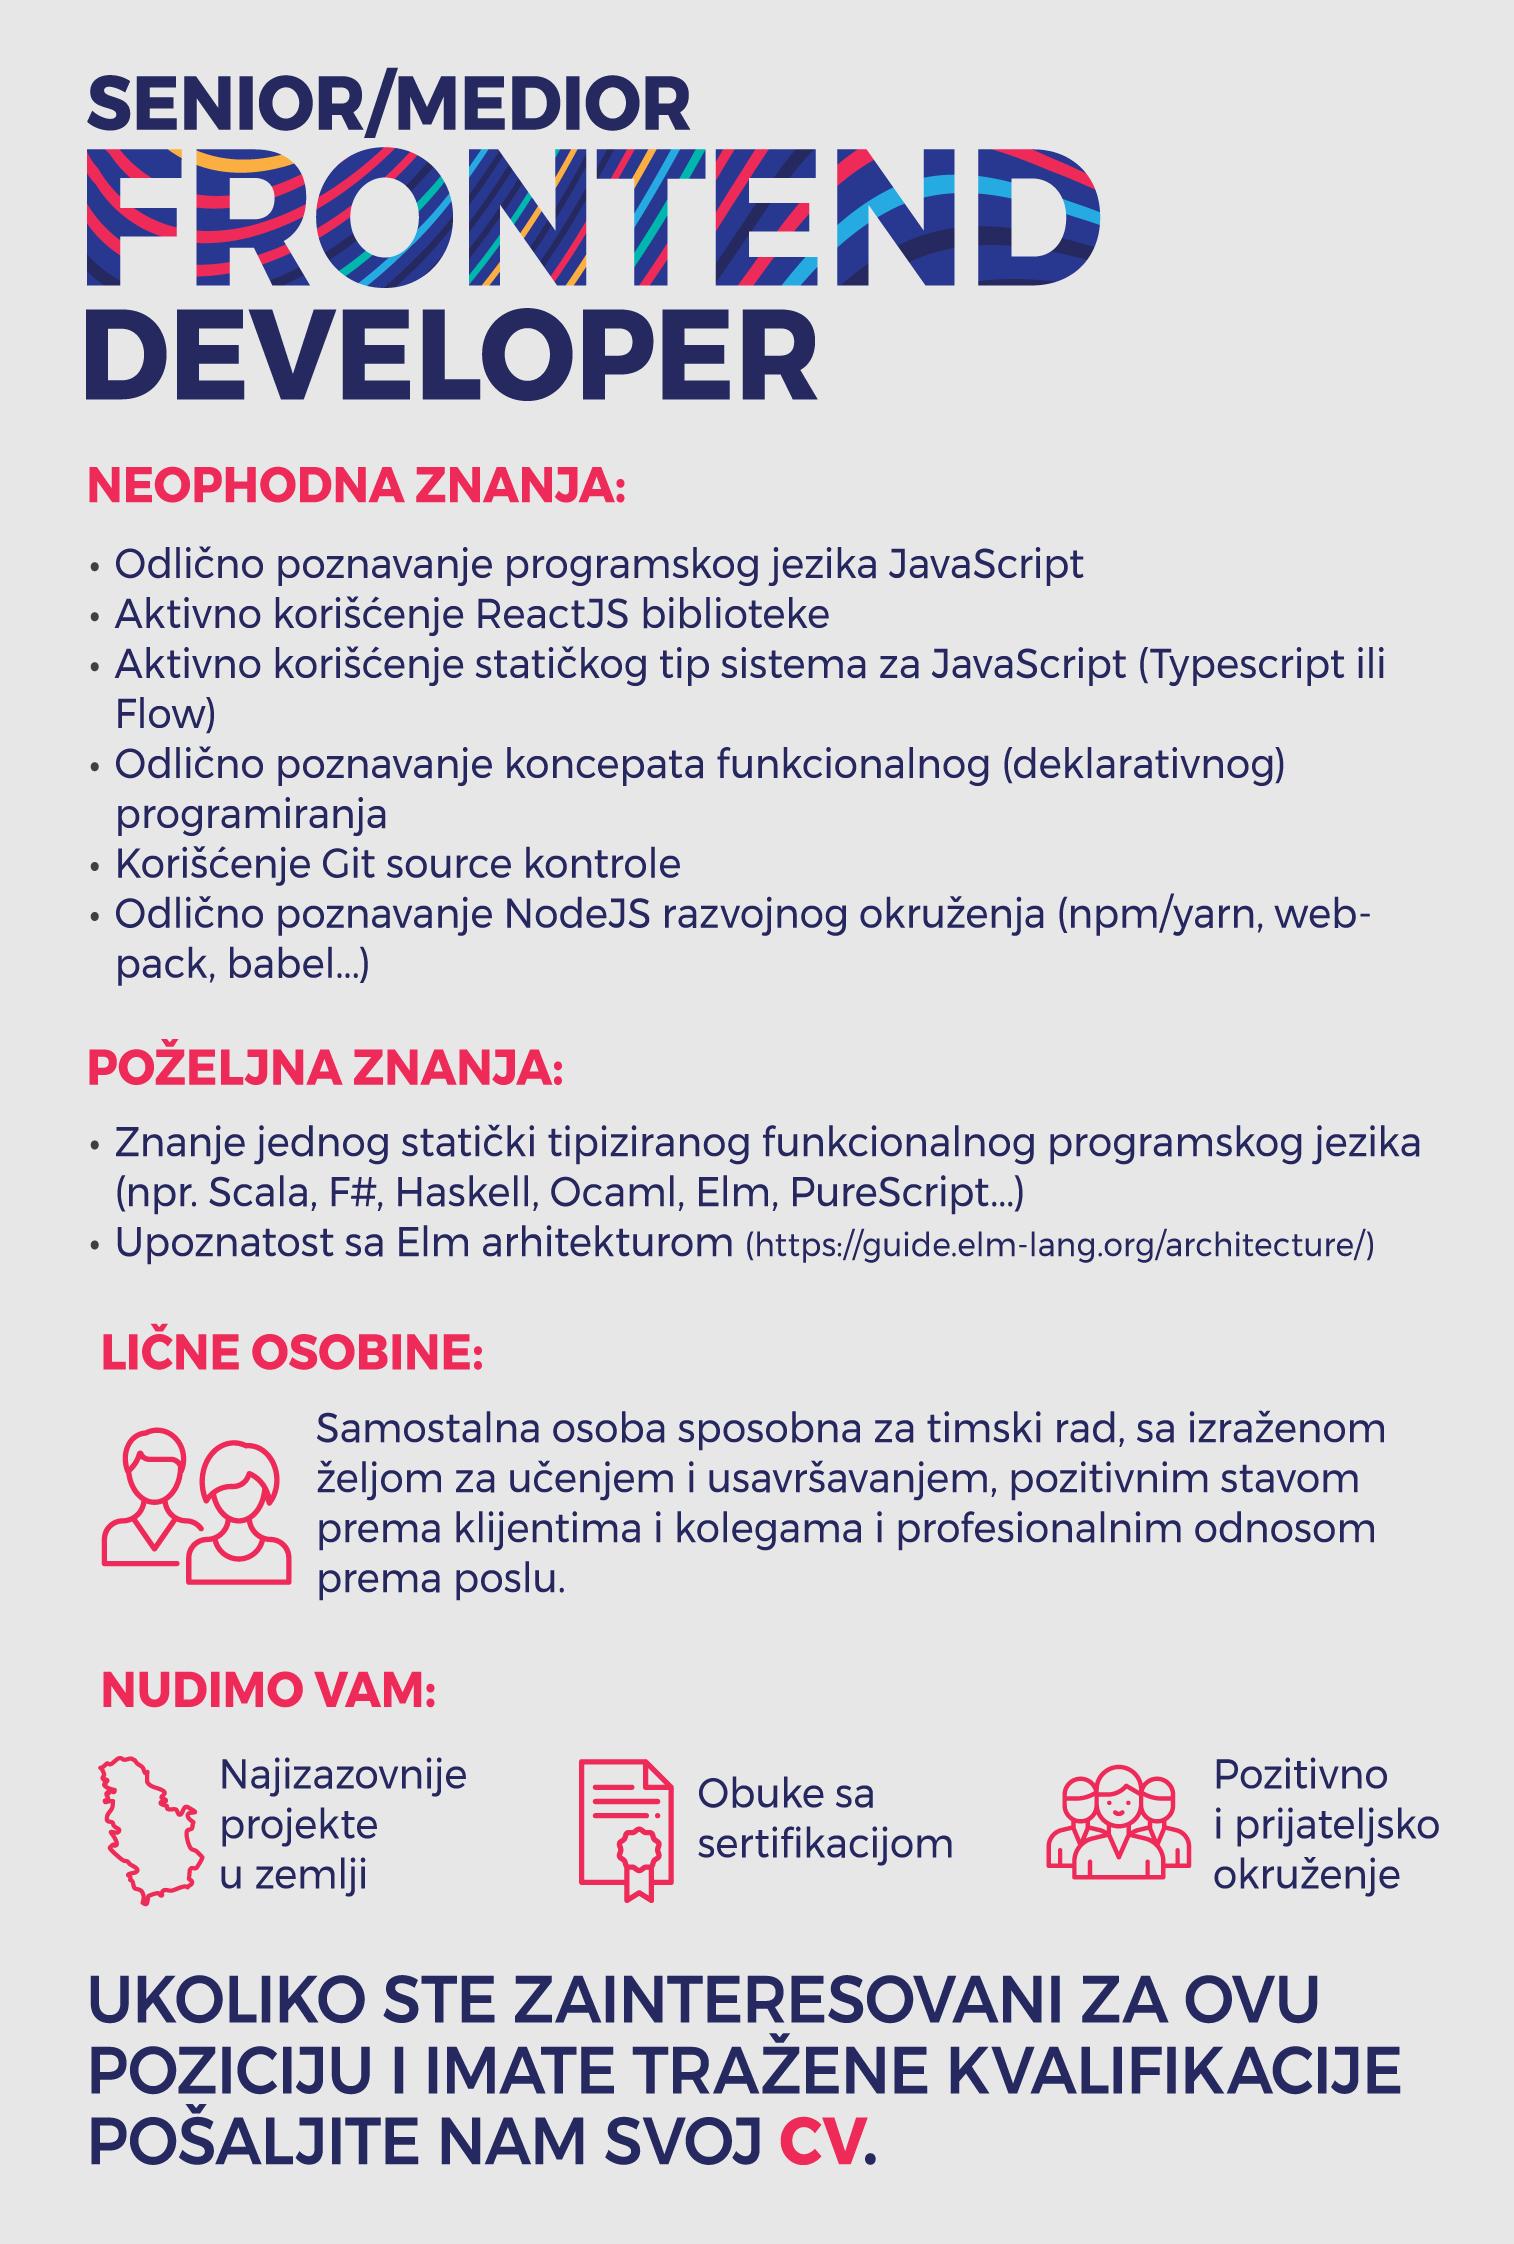 Senior-Medior Frontend programer 2